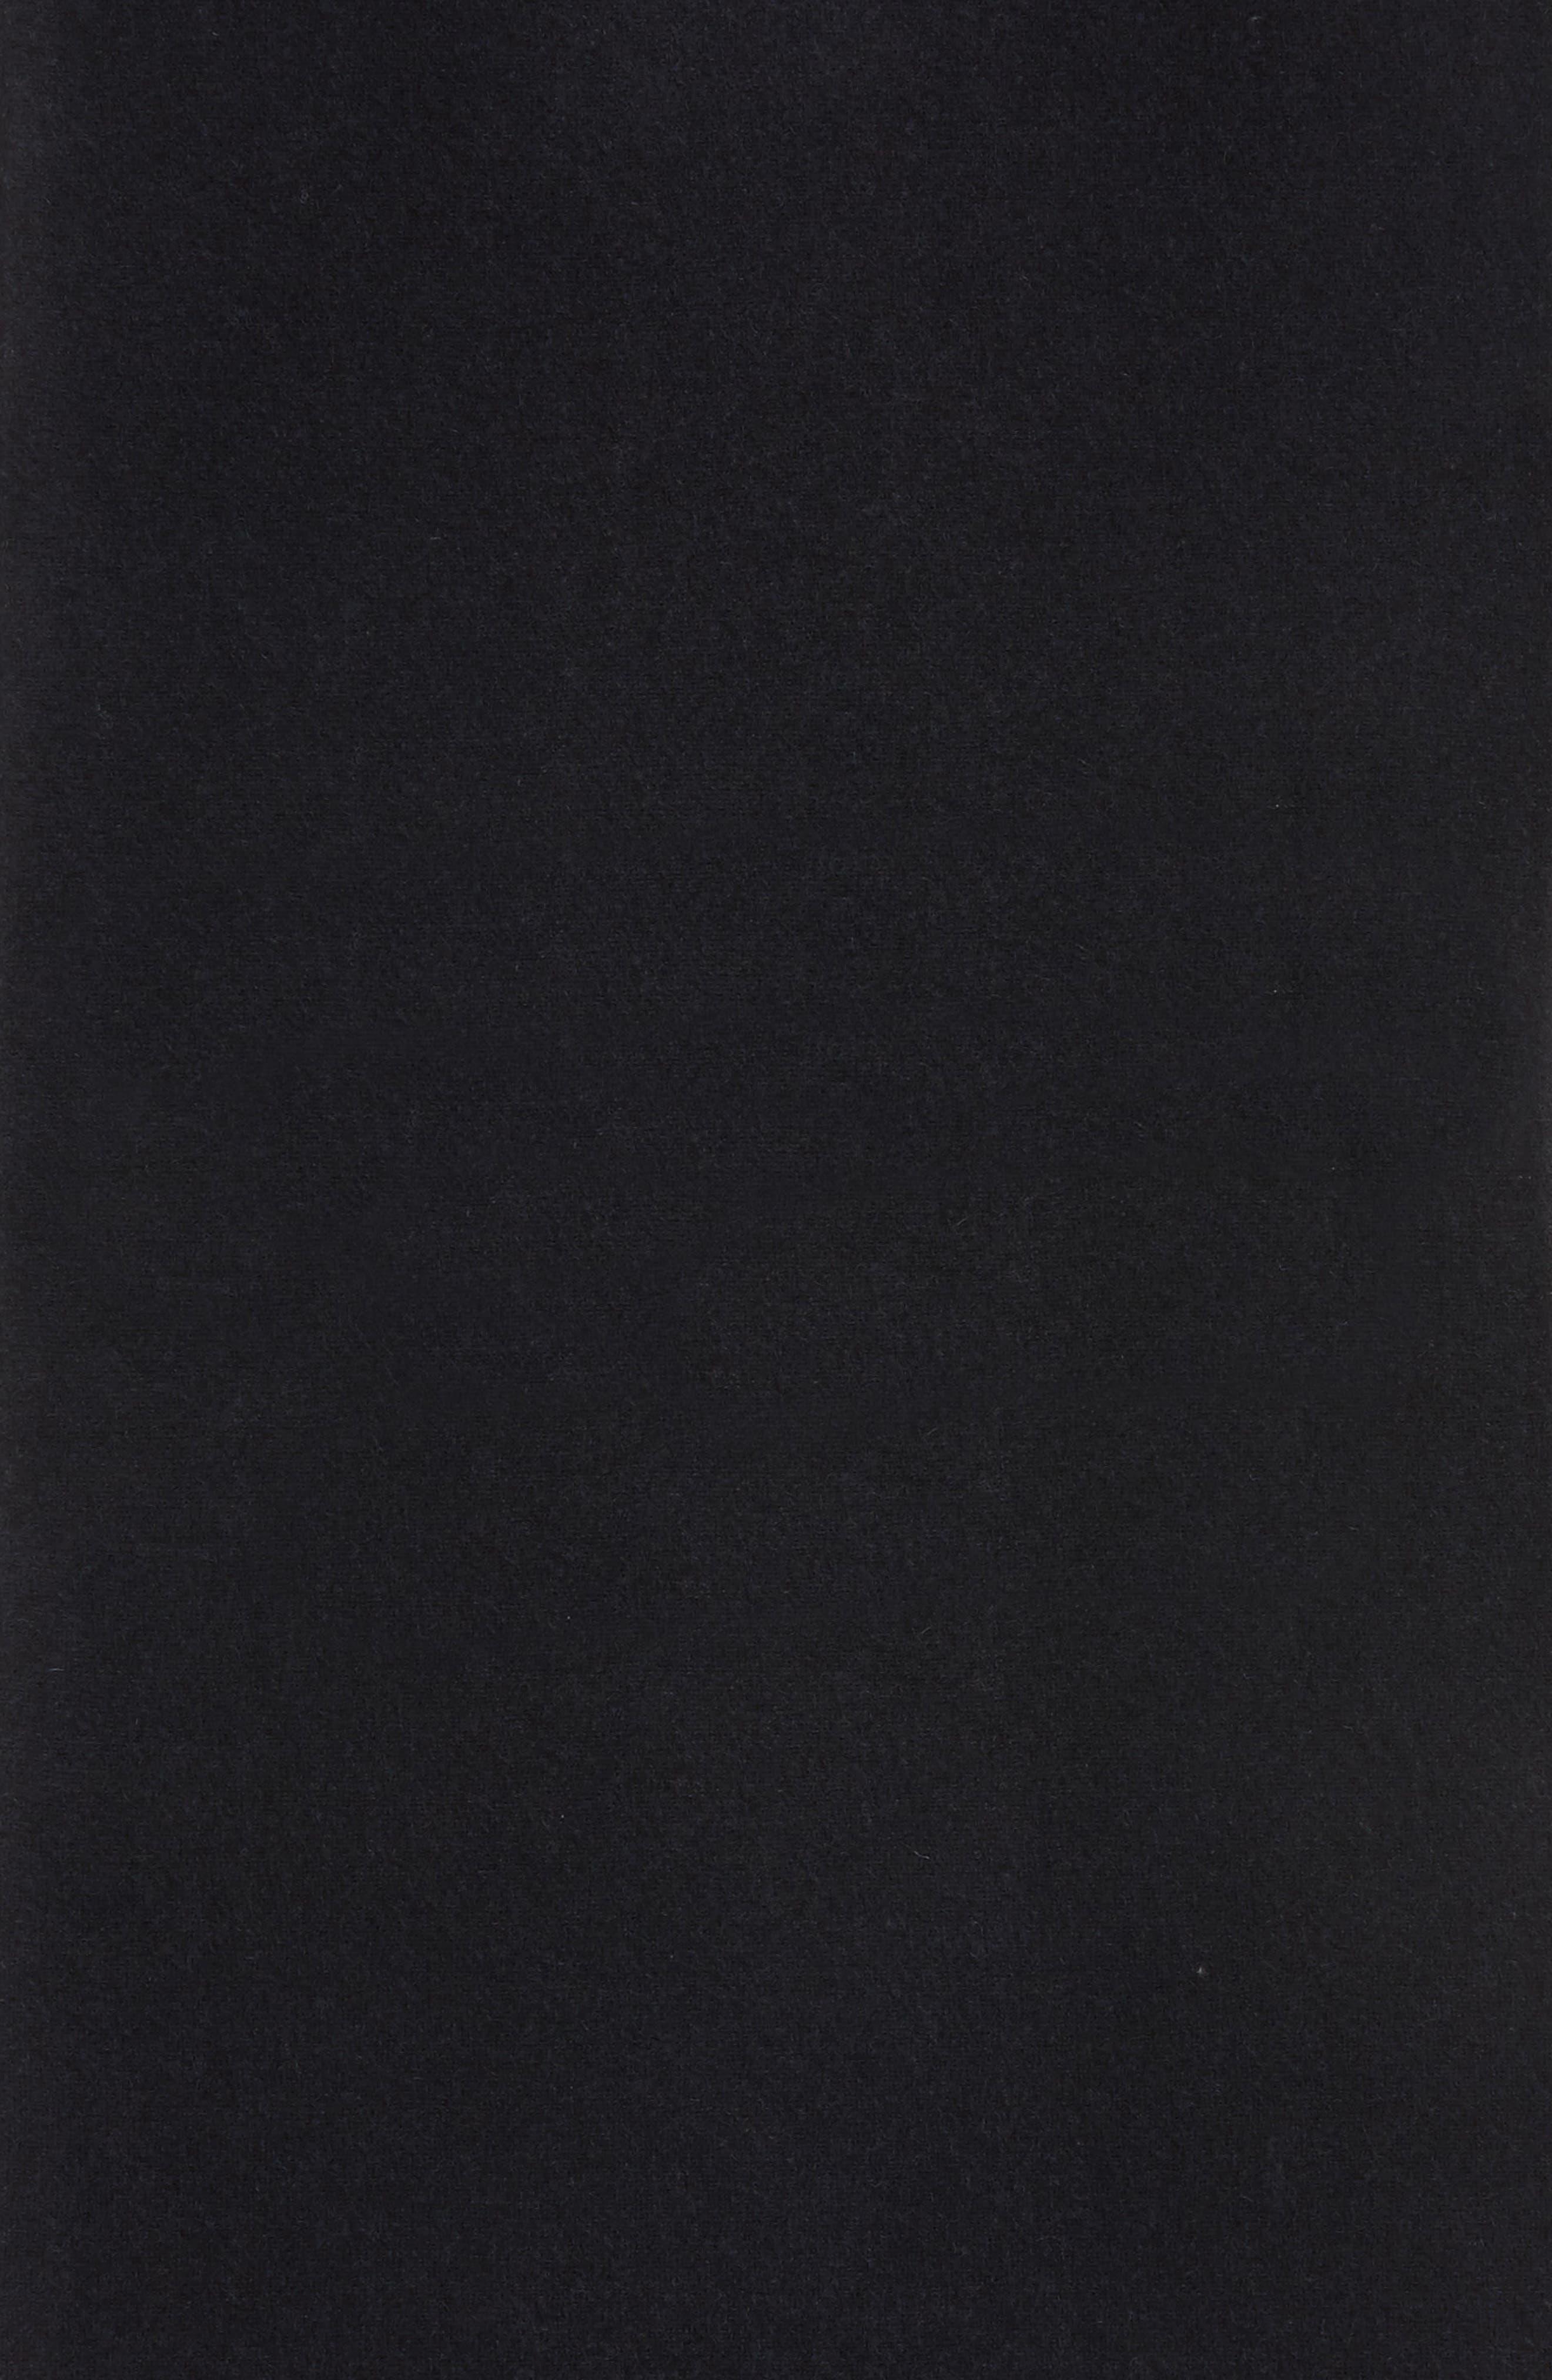 Cashmere Scarf,                             Alternate thumbnail 4, color,                             001